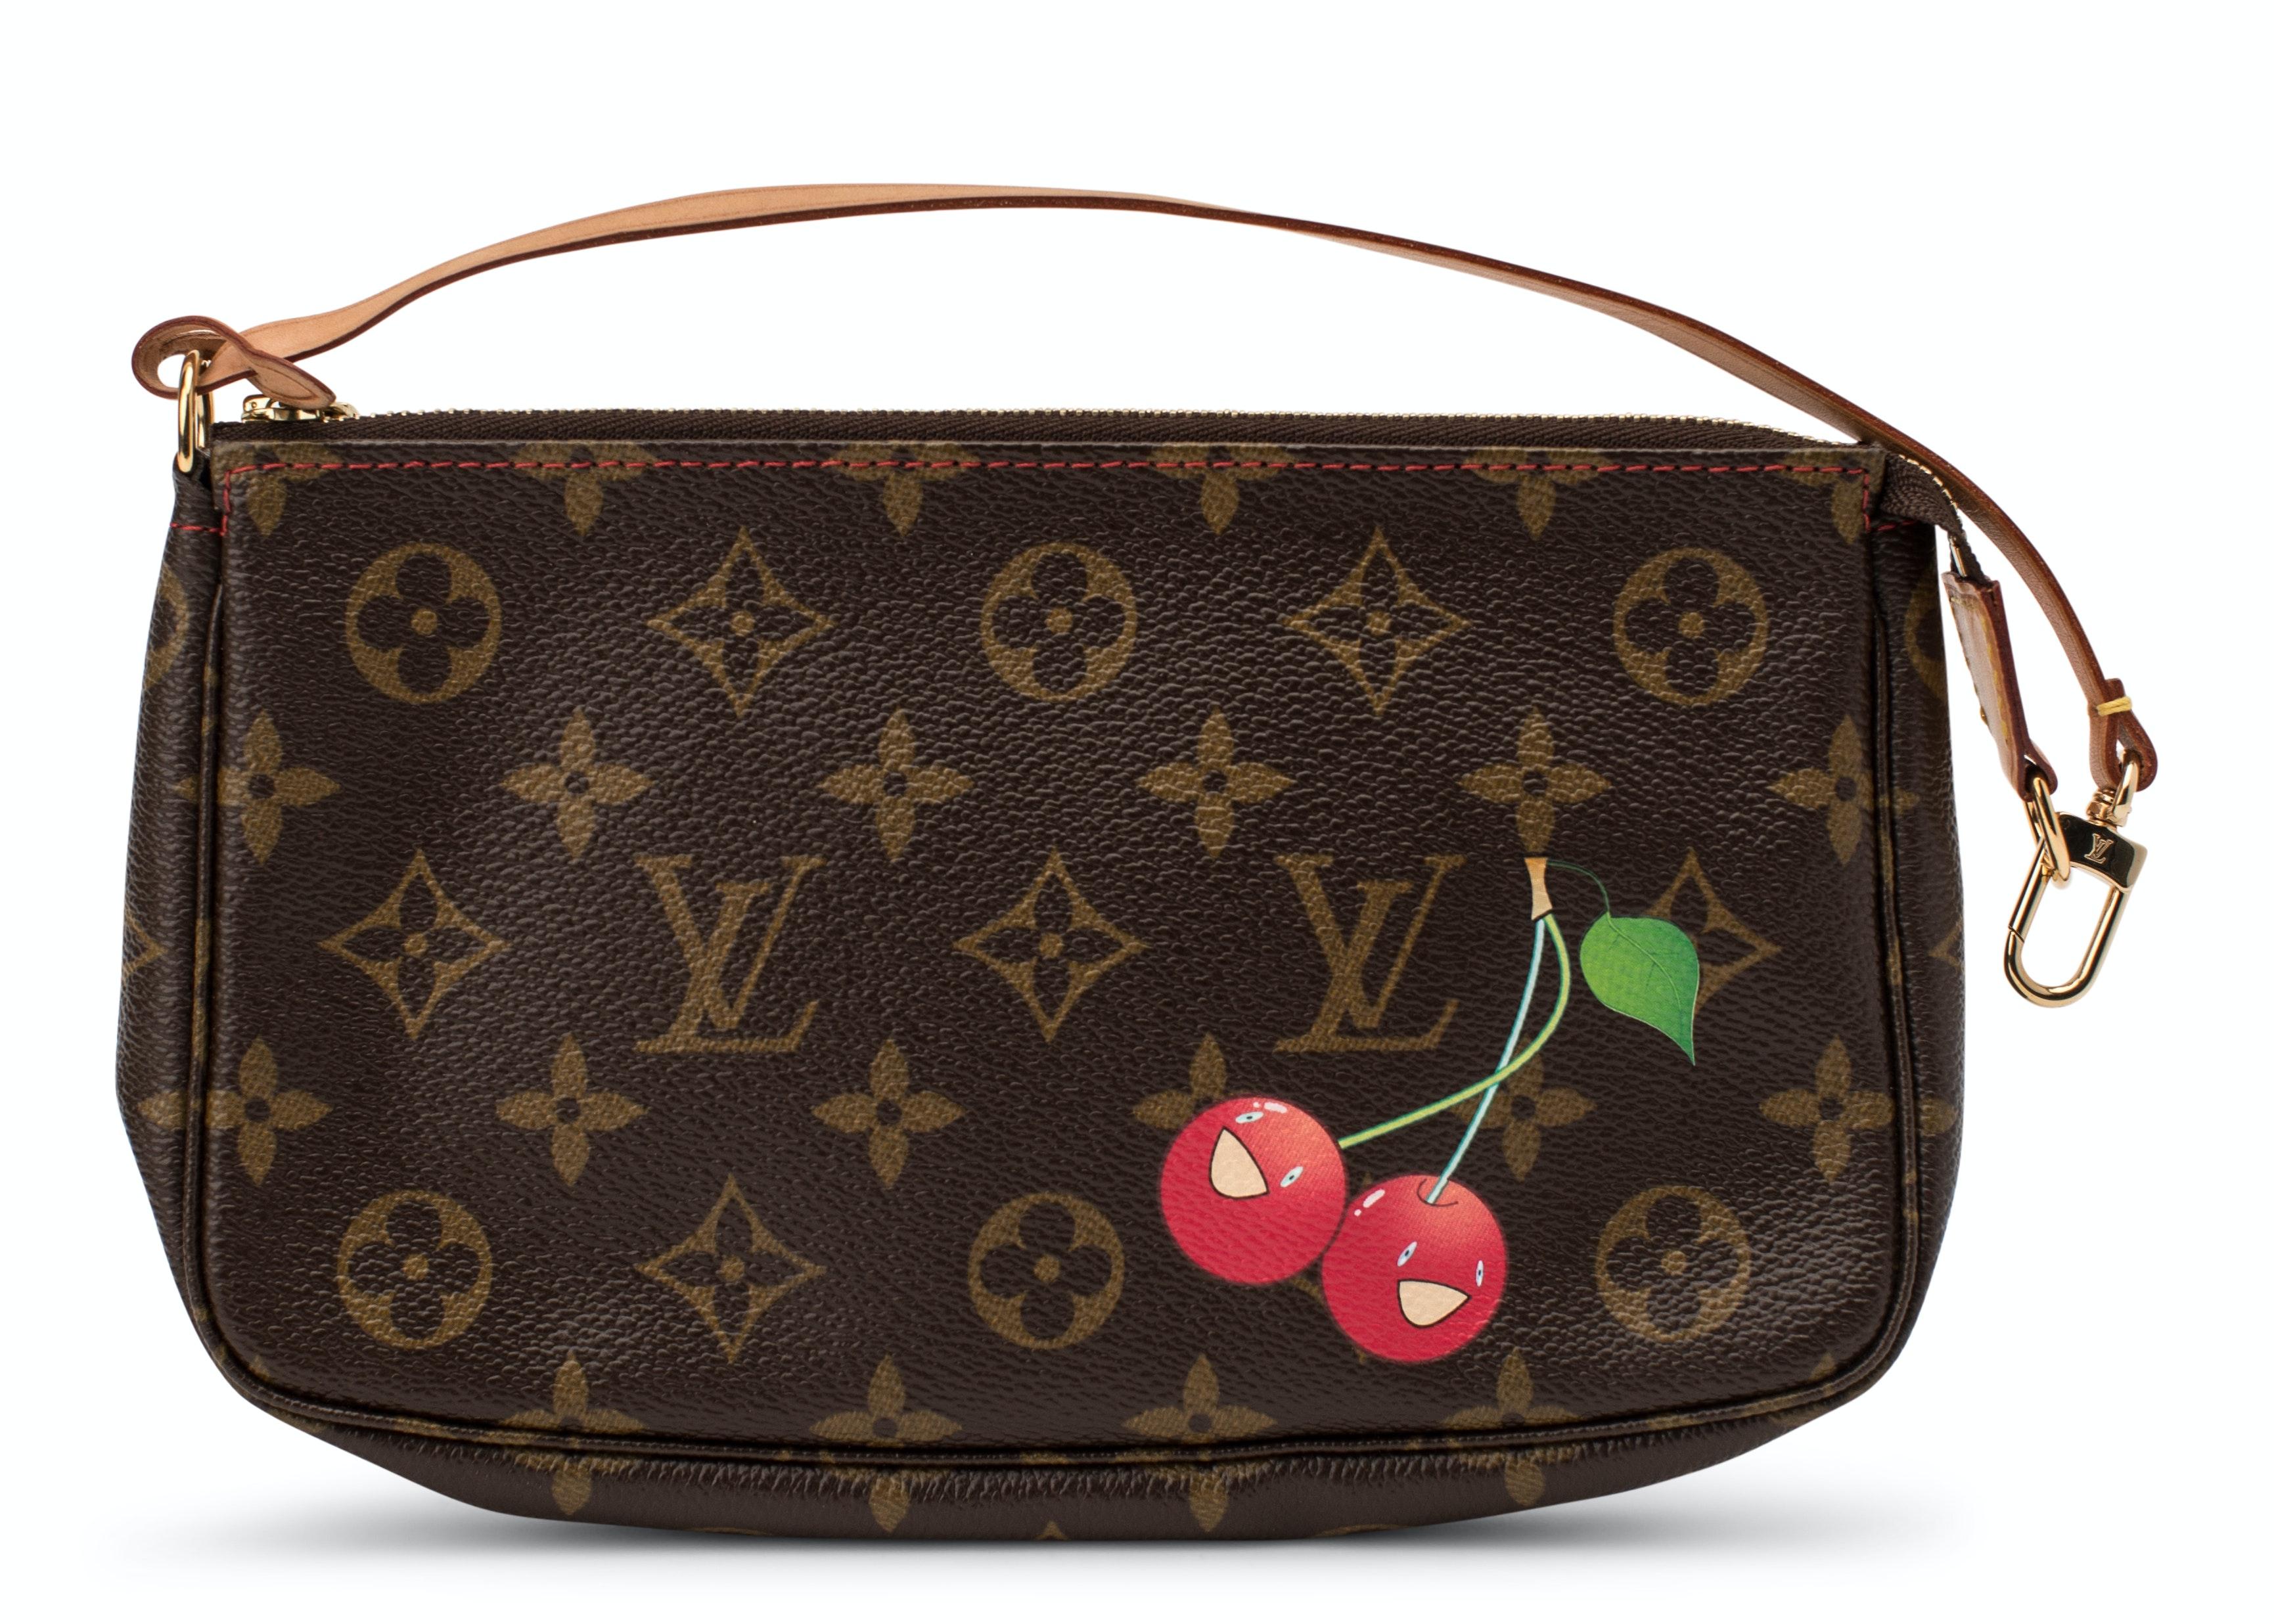 Louis Vuitton Pochette Accessoires Monogram Cherries Brown/Red